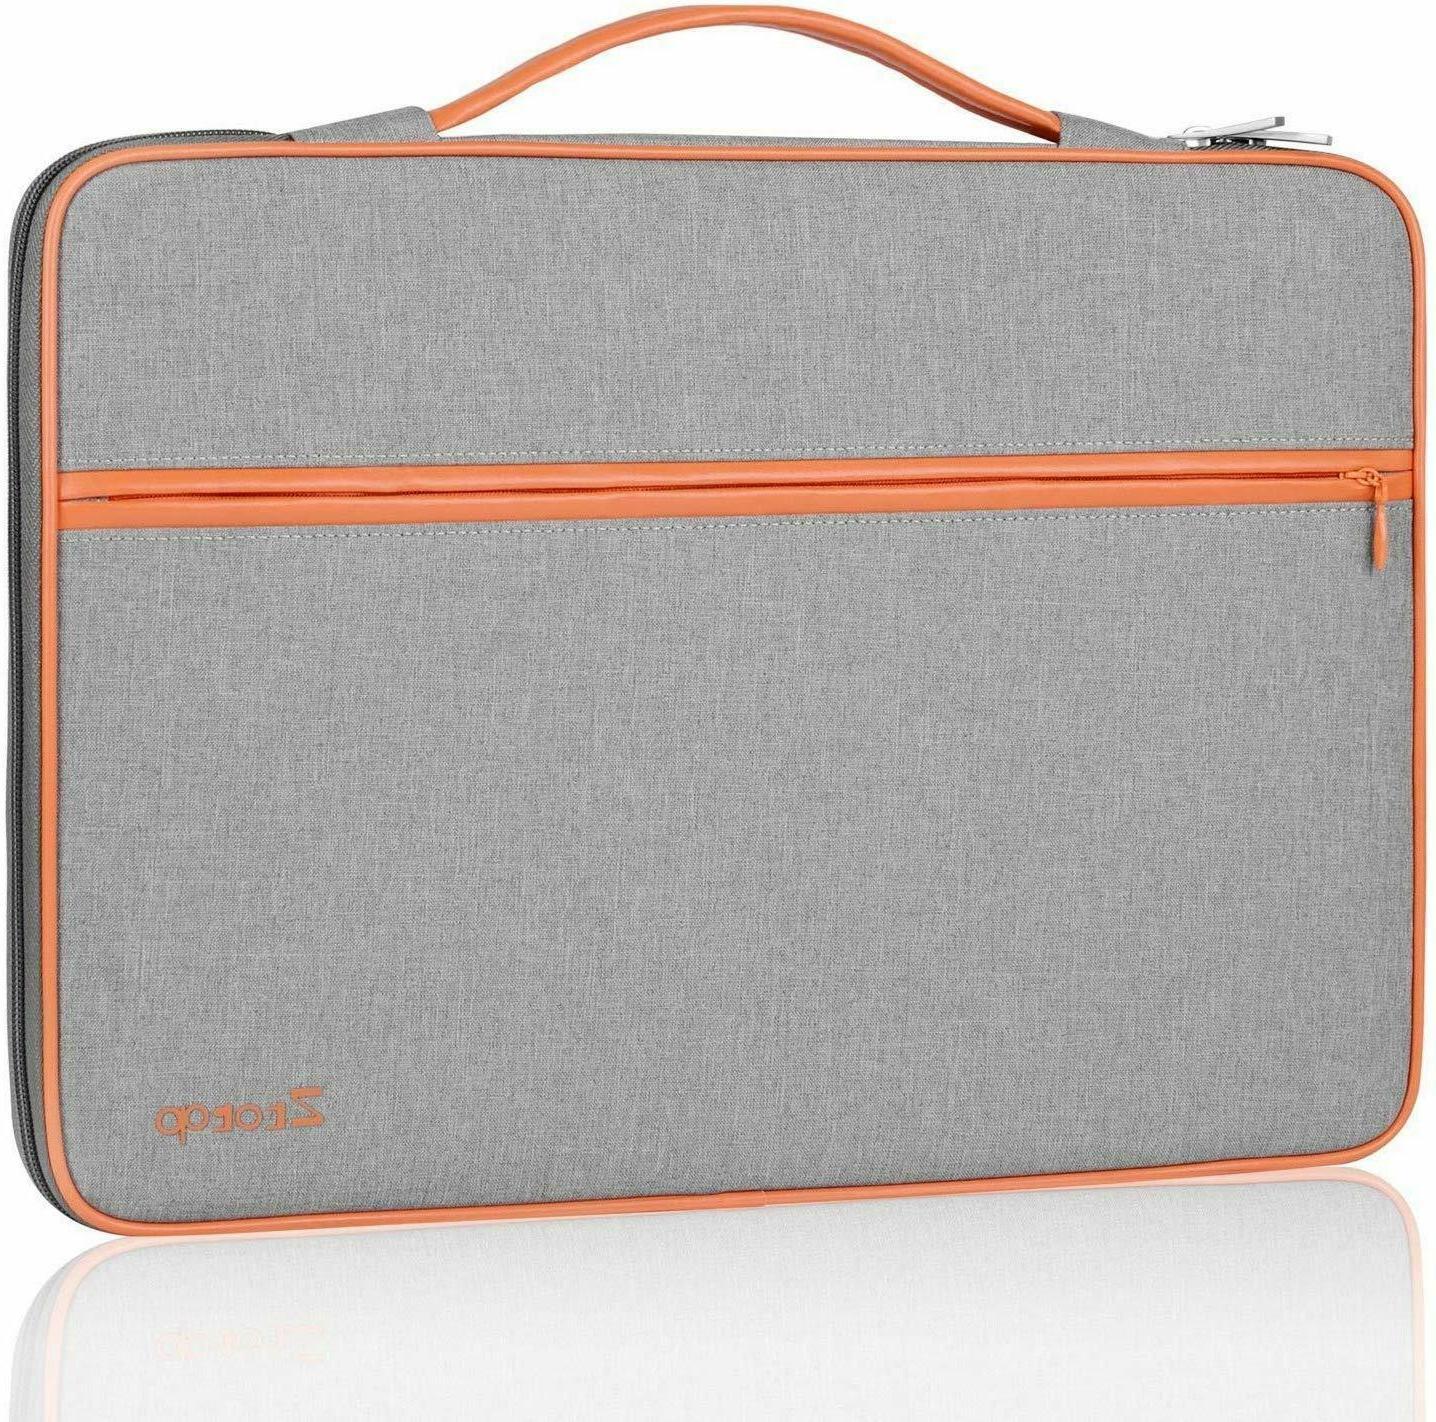 laptop sleeve protective waterproof bag for 13